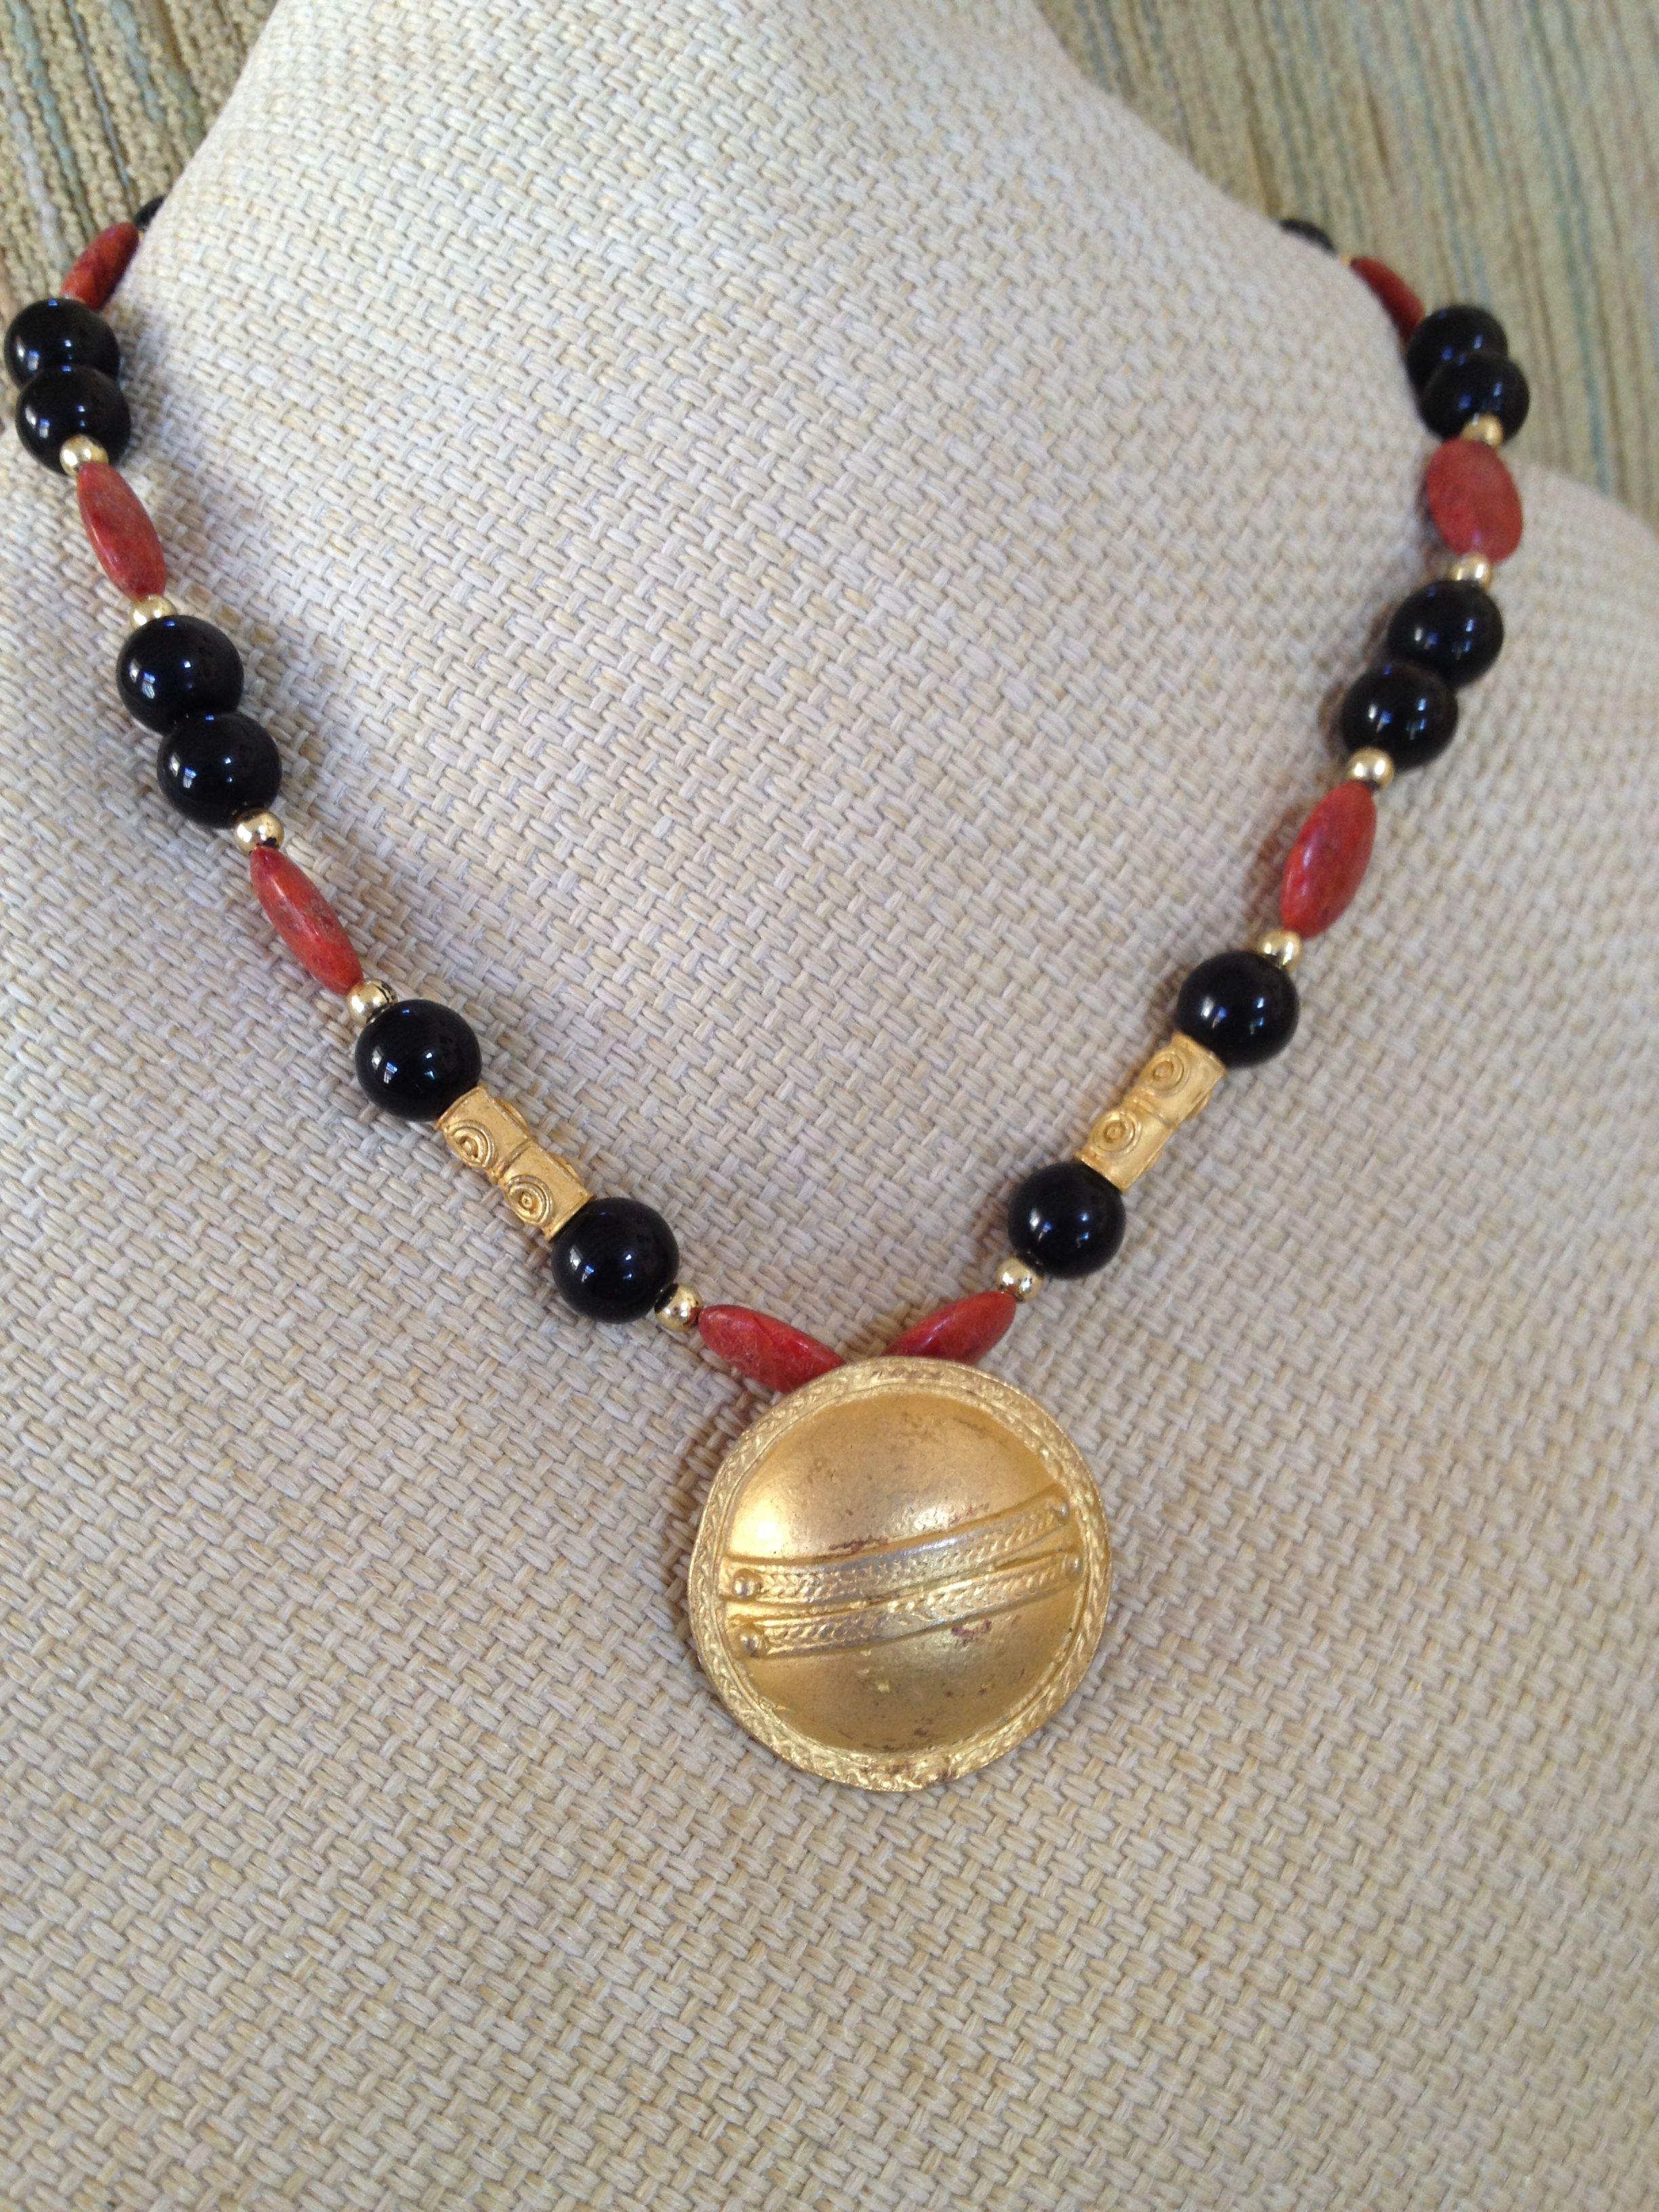 a45c2e6652dd Collar precolombino o étnico de ónix y coral